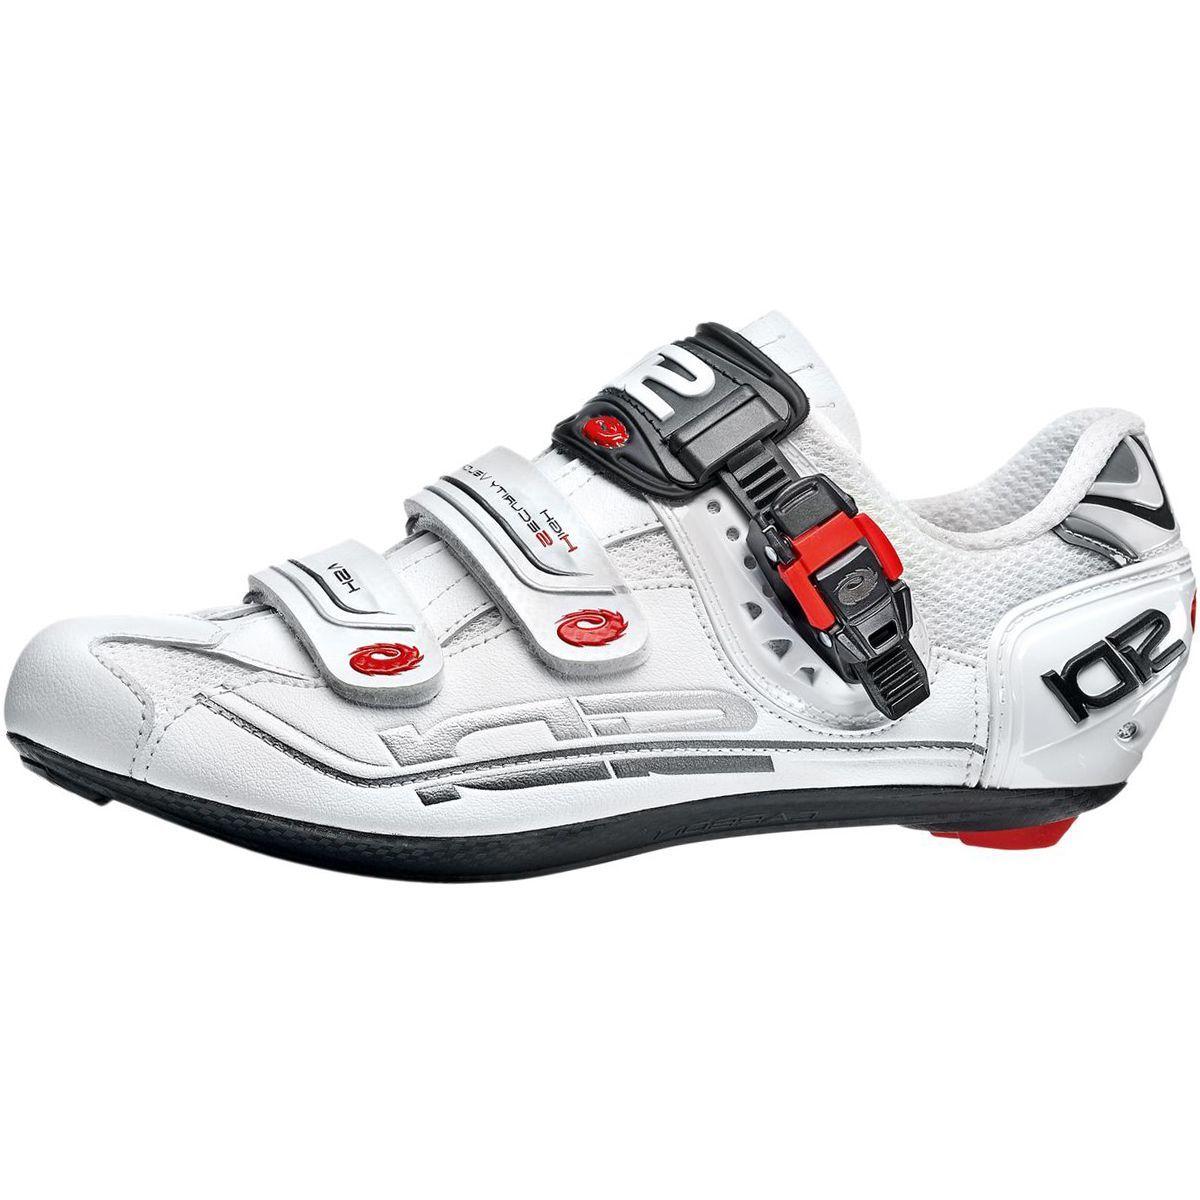 Sidi Genius 7 Carbon Mega Cycling Shoe - Men's